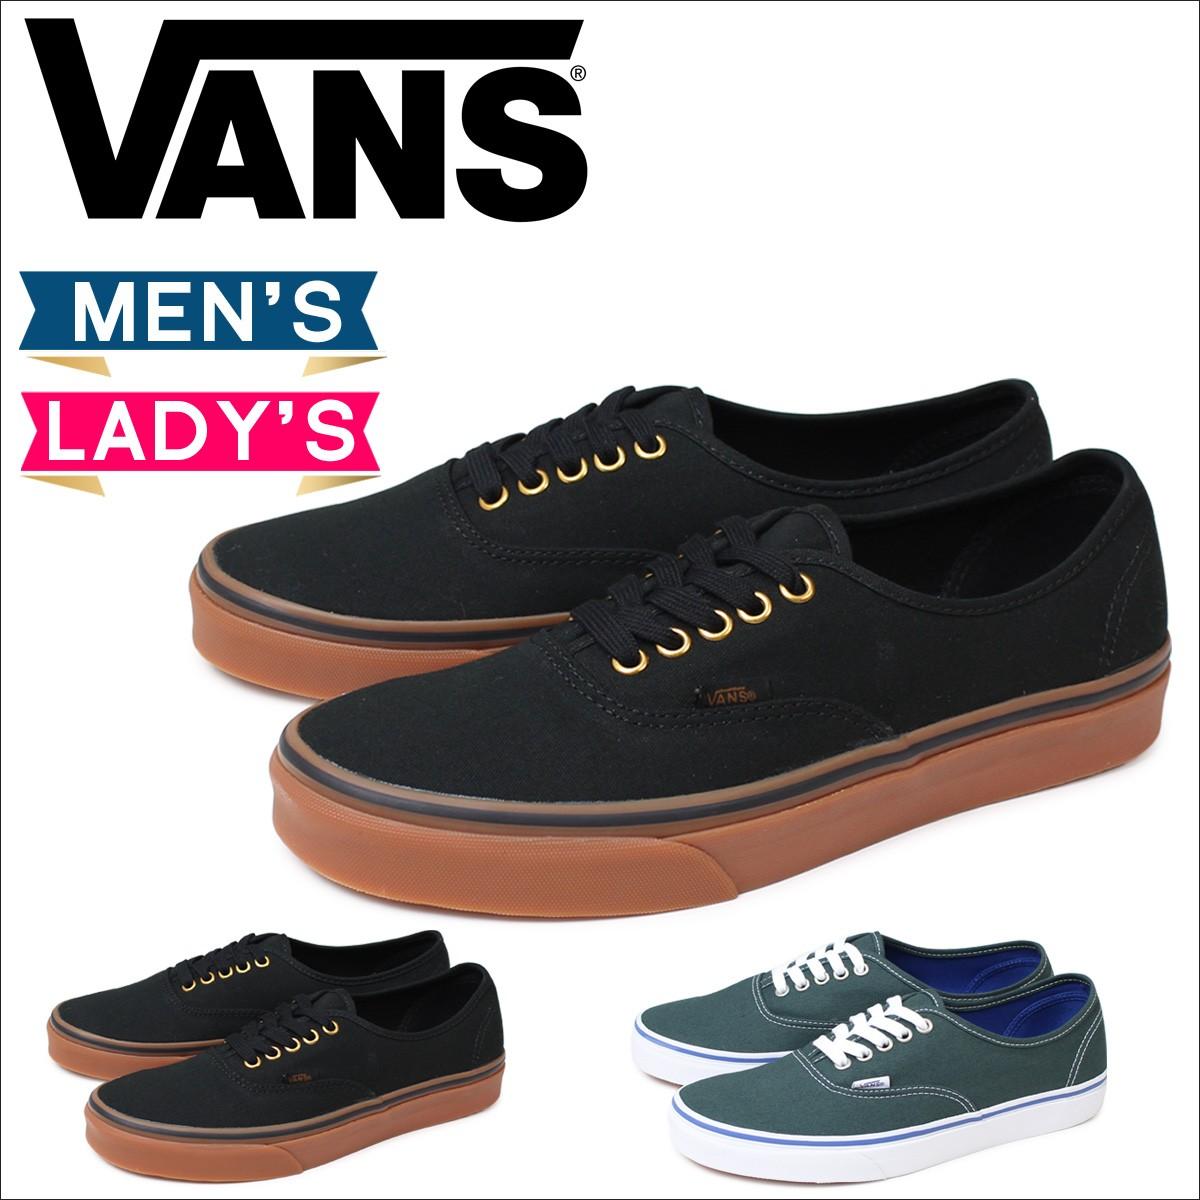 VANS オーセンティック スニーカー レディース メンズ バンズ ヴァンズ AUTHENTIC VN000TSVBXH VN0004MLJPT 靴 ブラック グリーン